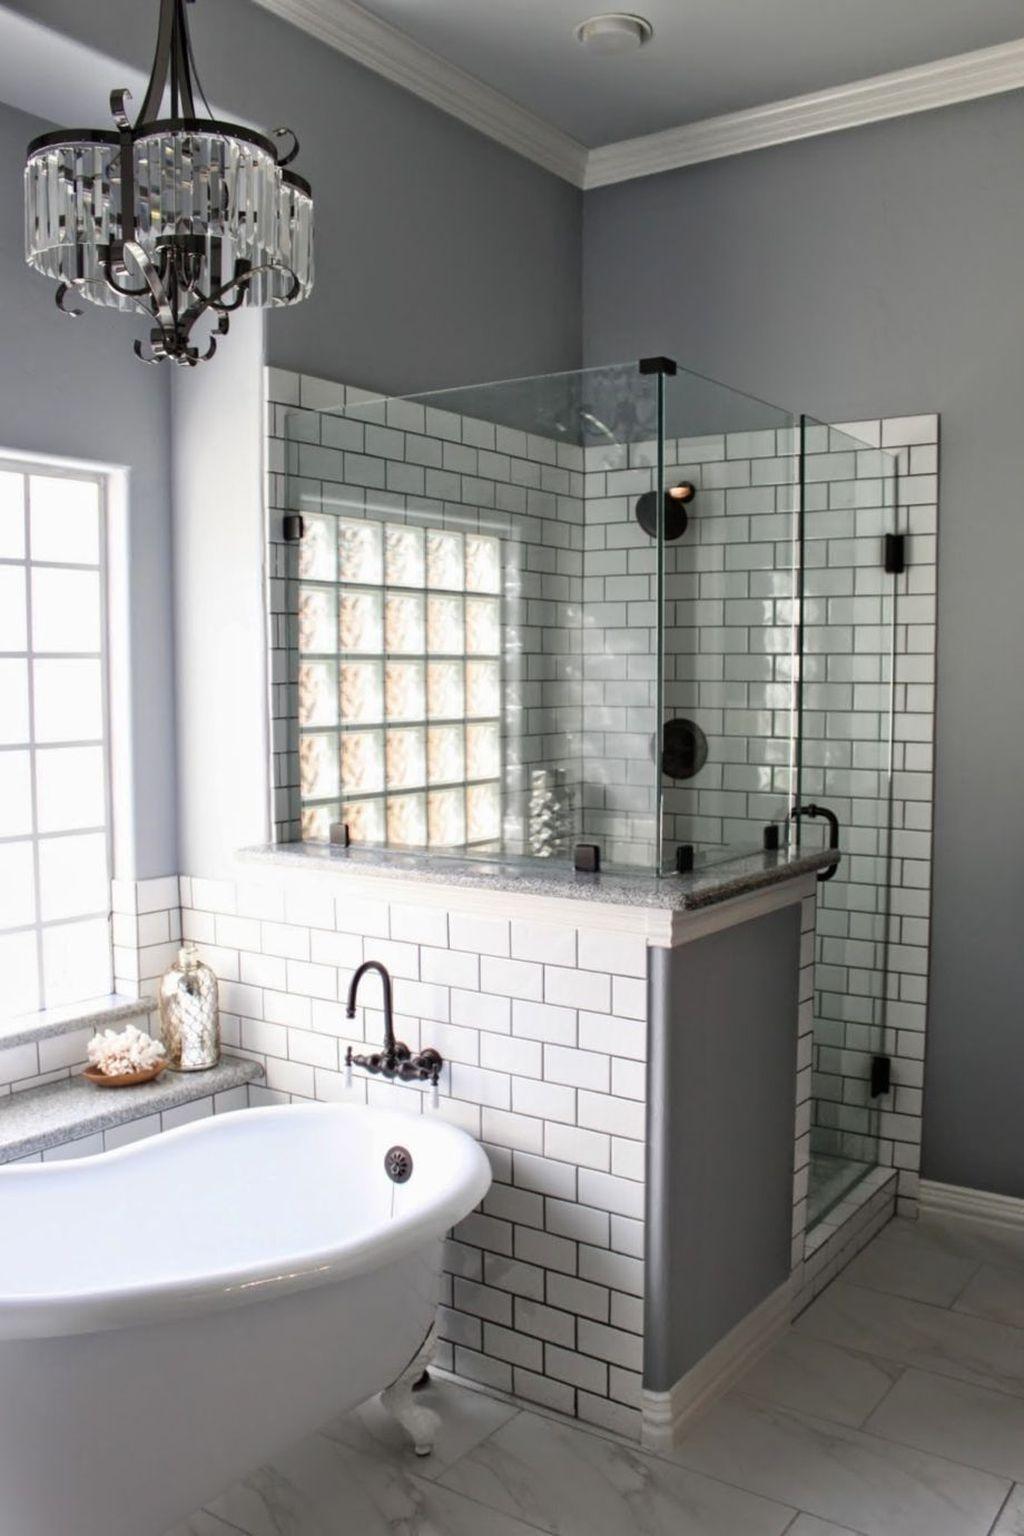 3x5 Bathroom Rug Nuloom Handmade Indoor Blue Rug Review Small